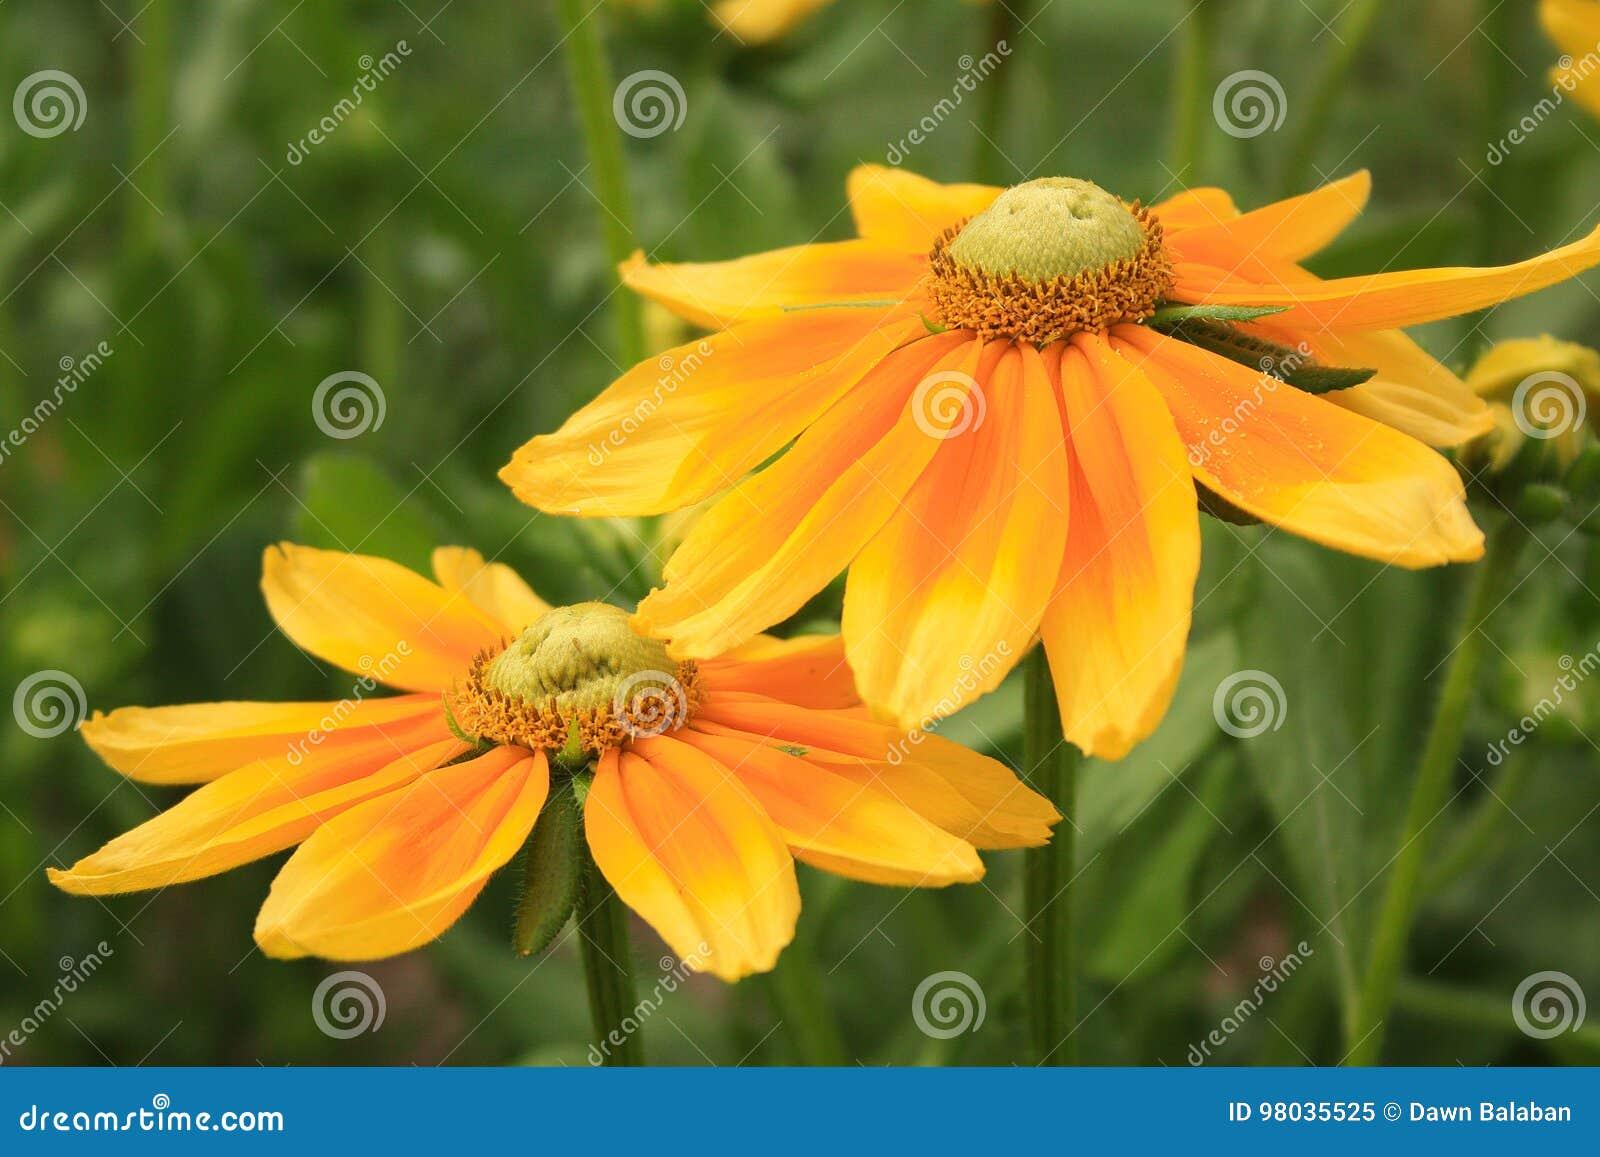 Two Yellow Orange Flowers In Center Stock Image Image Of Gardening